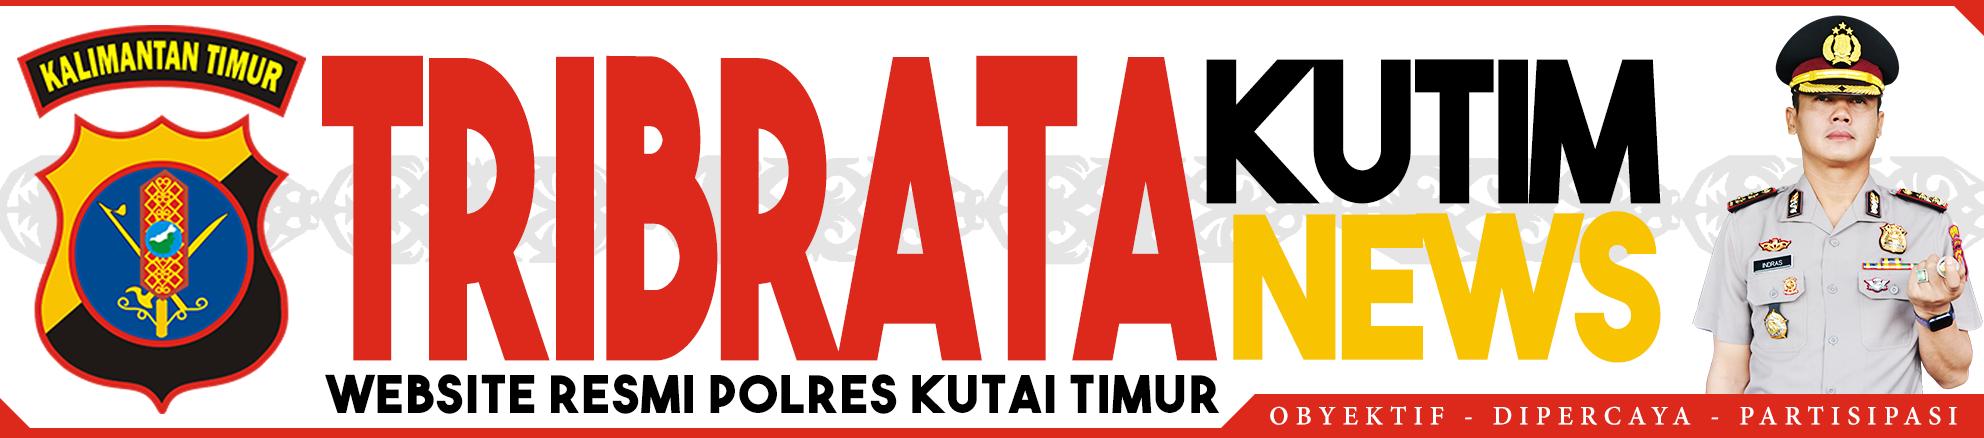 Tribrata Kutai Timur News